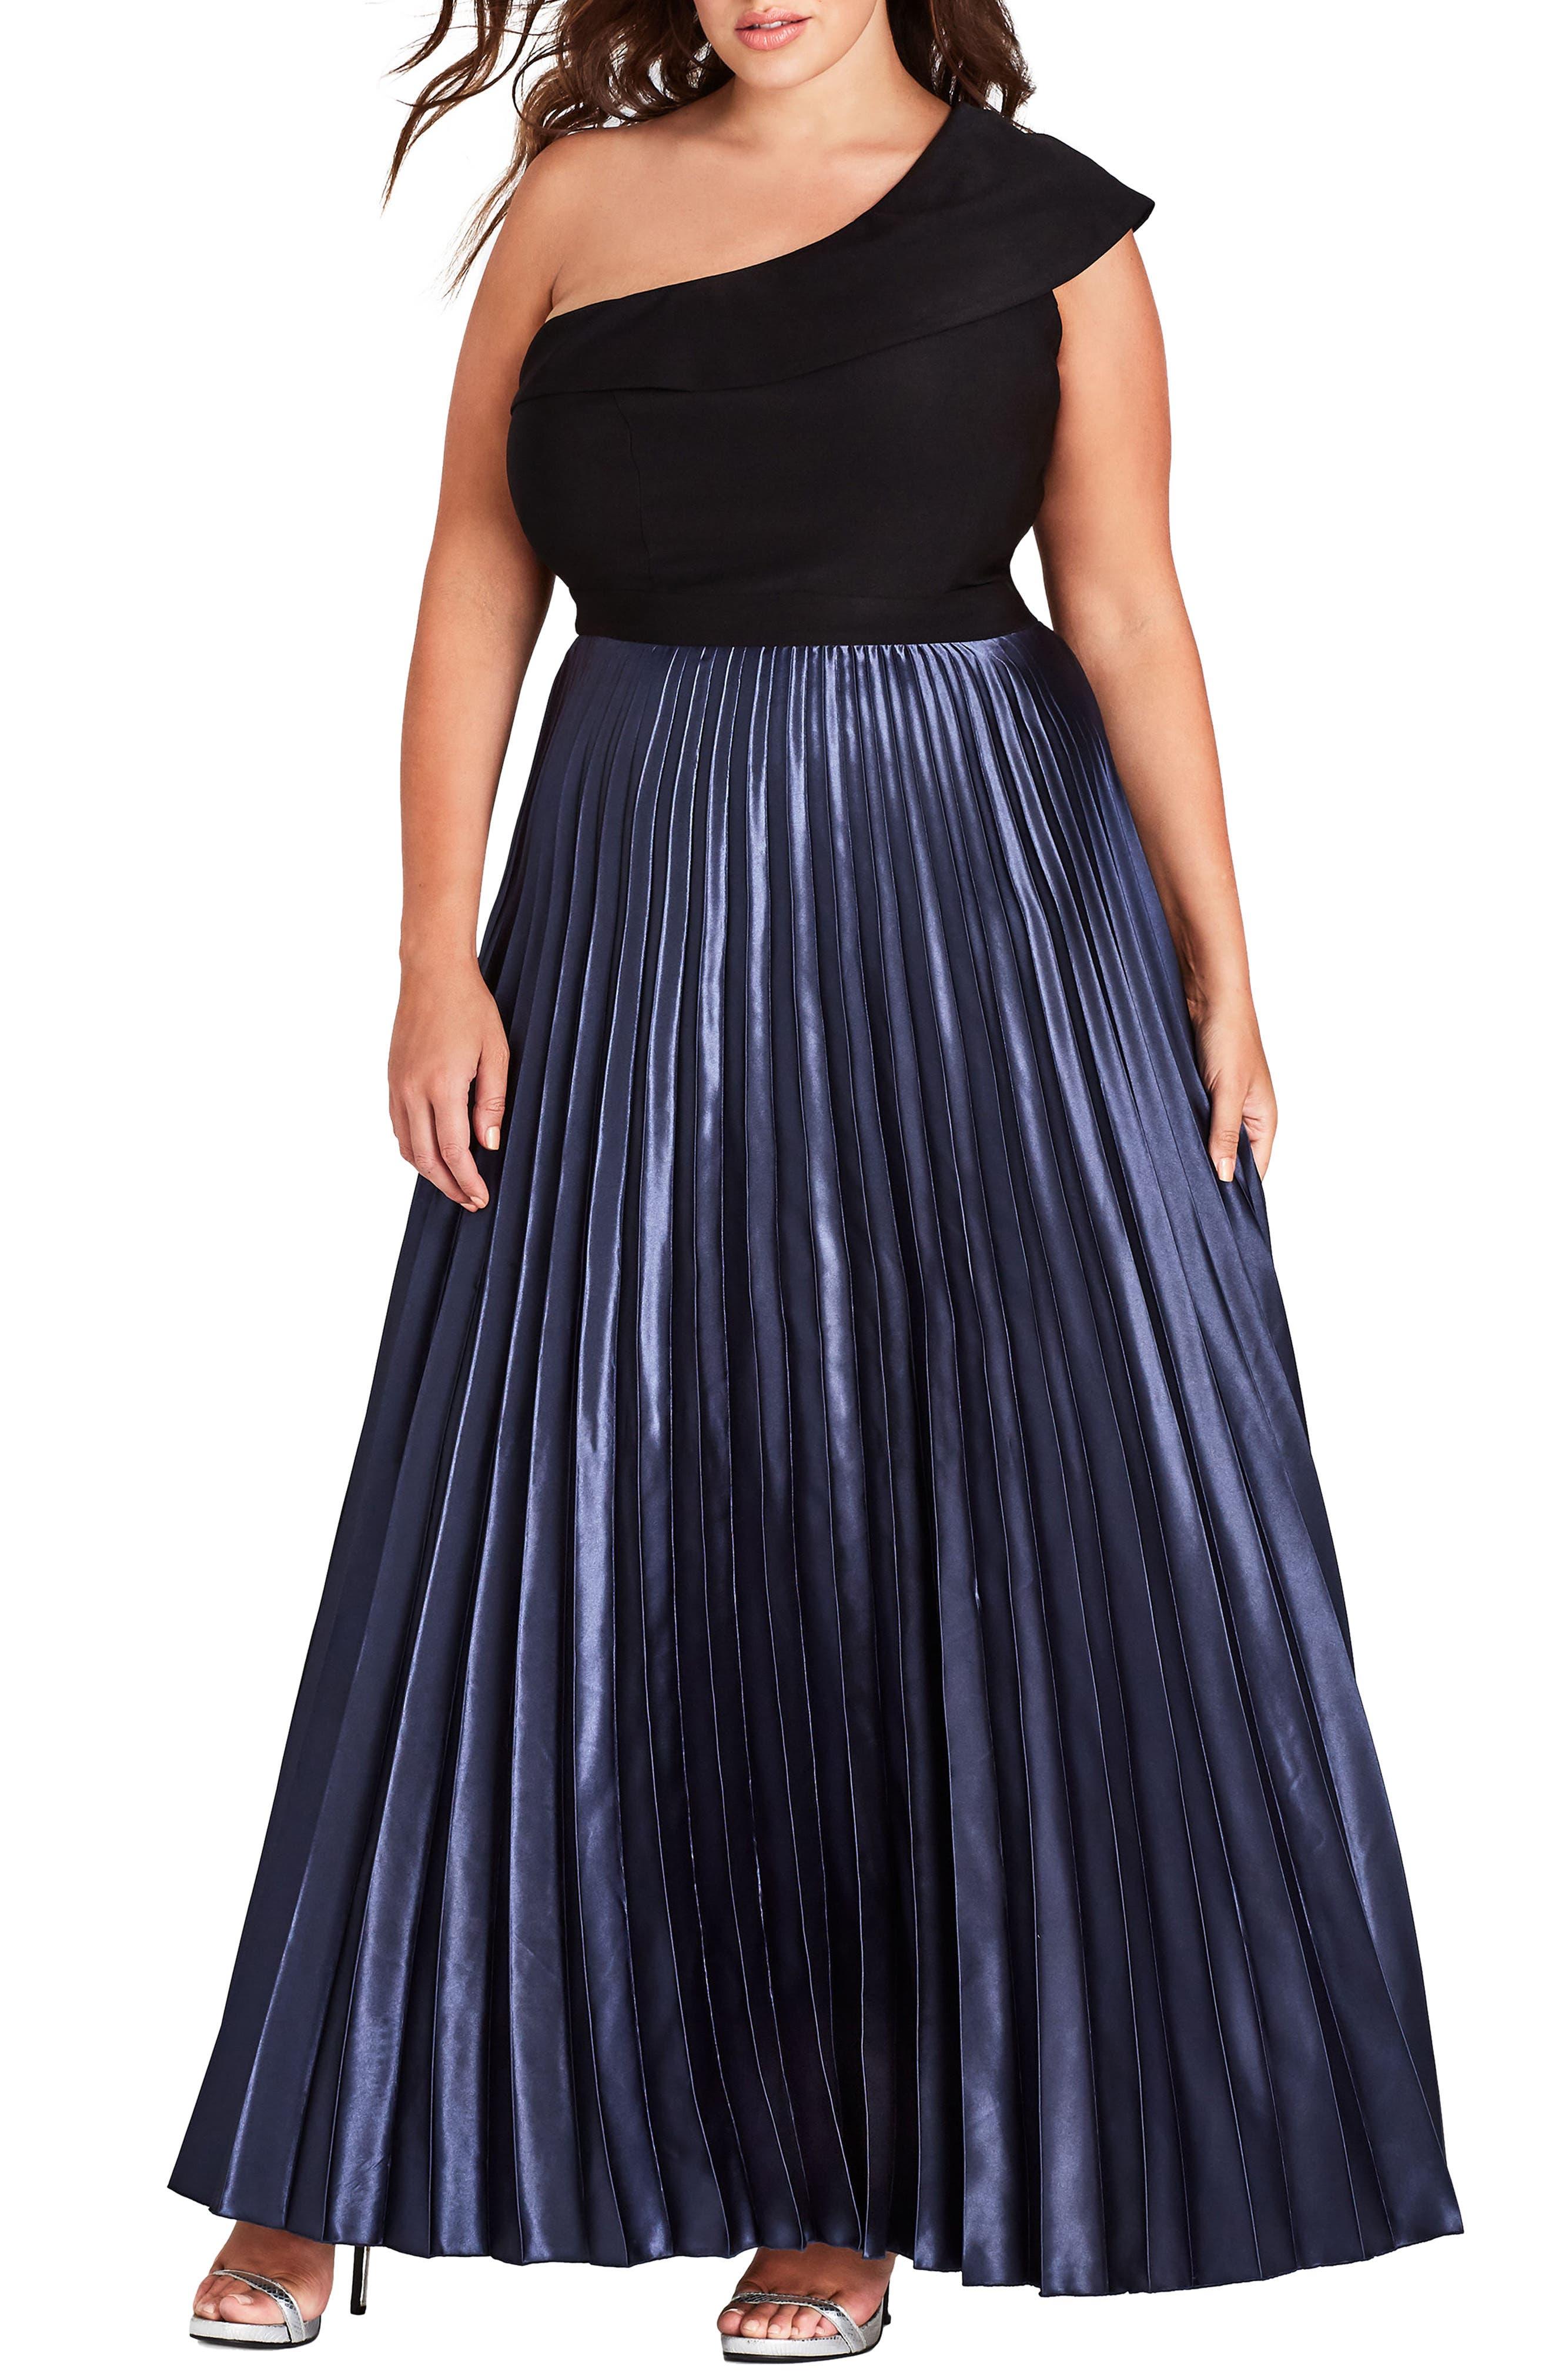 Rosa One Shoulder Pleat Maxi Dress,                             Main thumbnail 1, color,                             Smoke